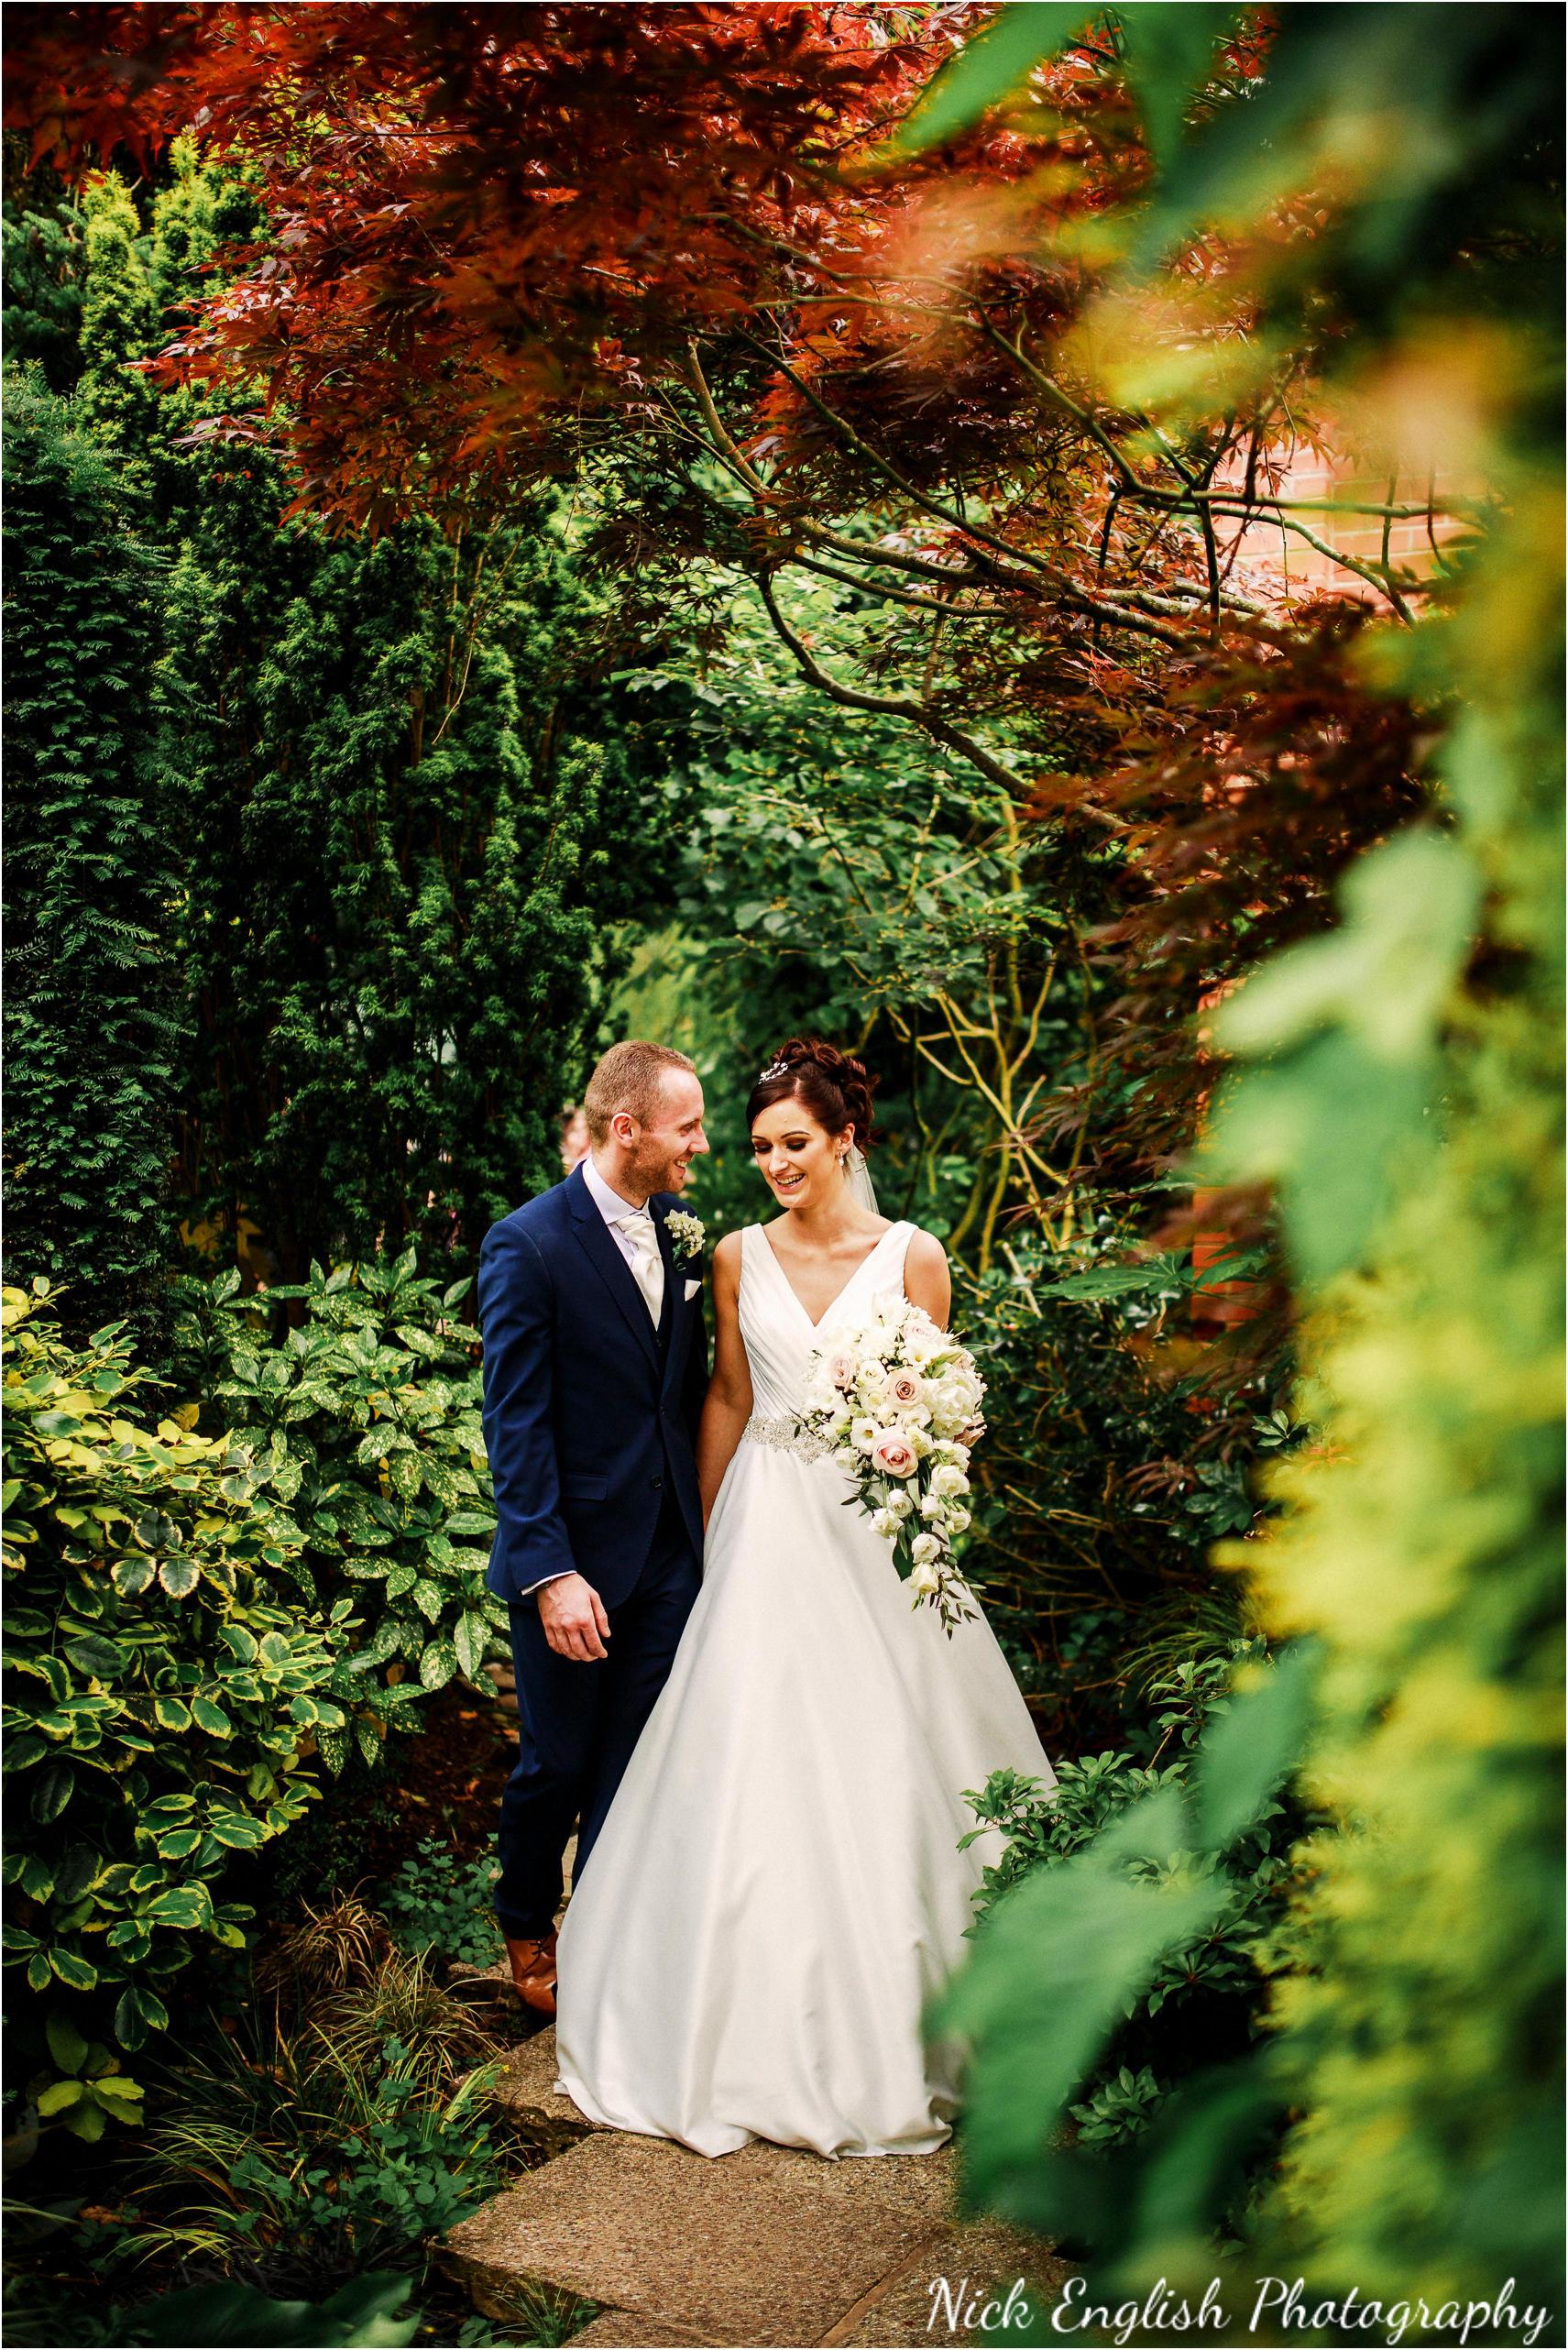 Emily David Wedding Photographs at Barton Grange Preston by Nick English Photography 141jpg.jpeg